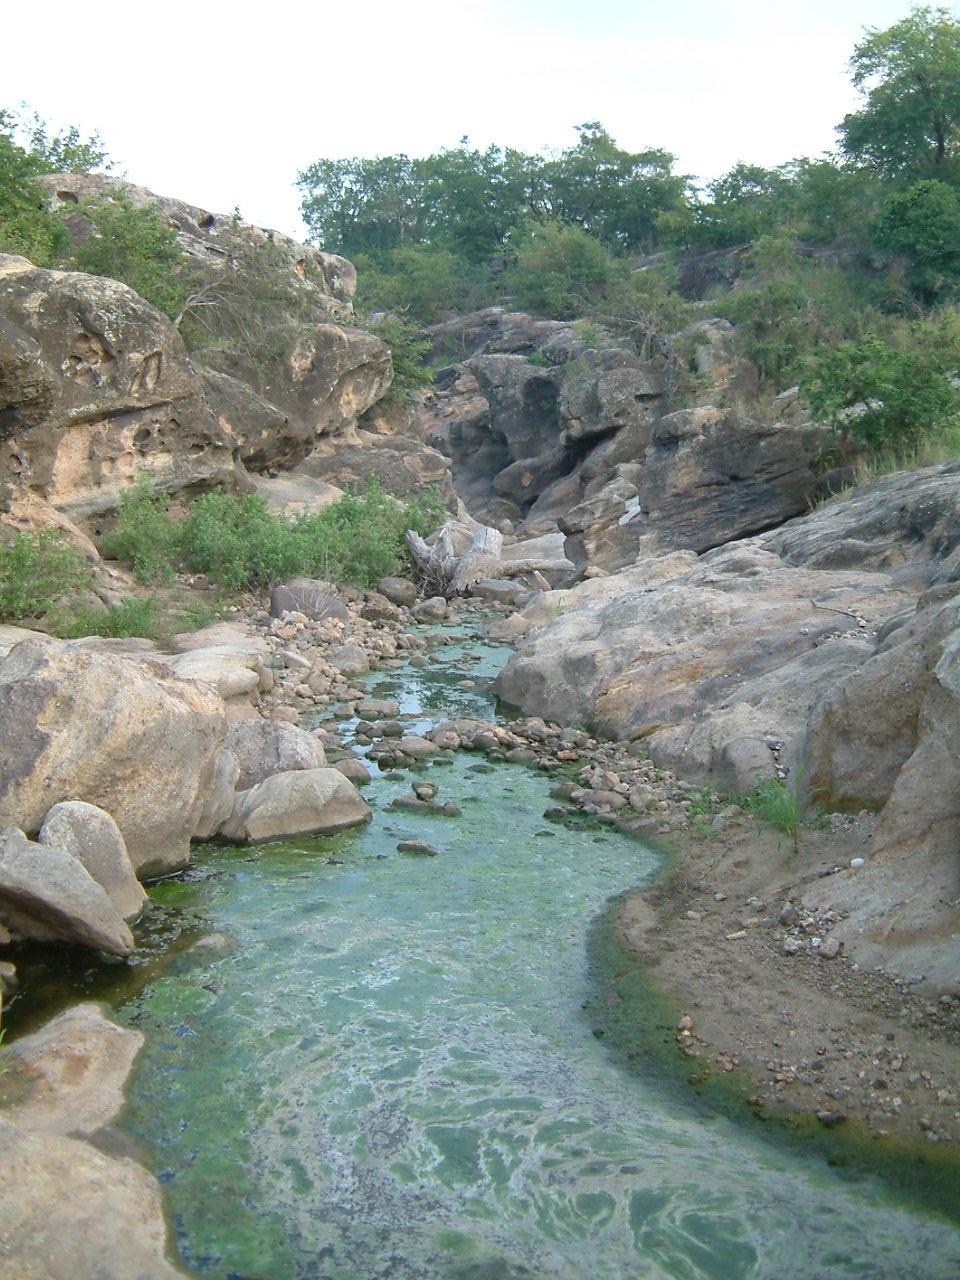 Mwabvi rivier in Mwabvi Wildlife Reserve Malawi